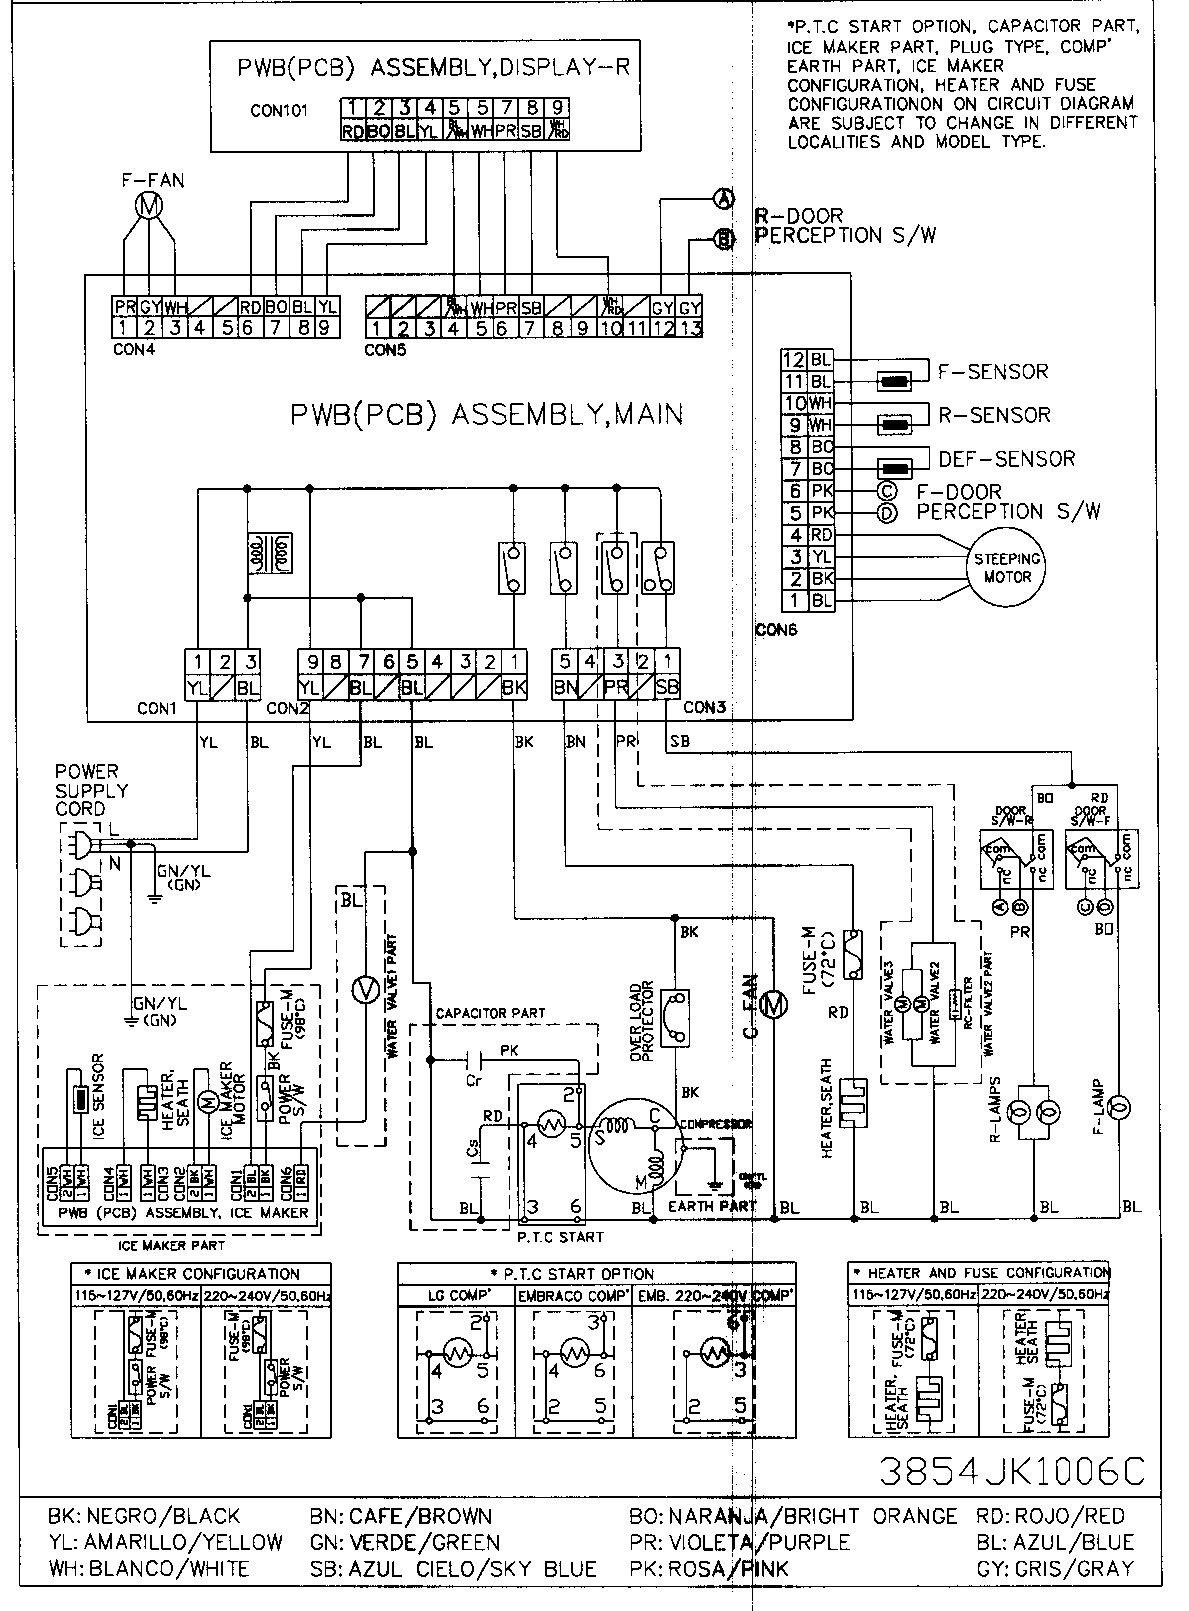 electrical wiring diagram refrigeration sub zero refrigerator wiring diagram wiring diagram data  sub zero refrigerator wiring diagram